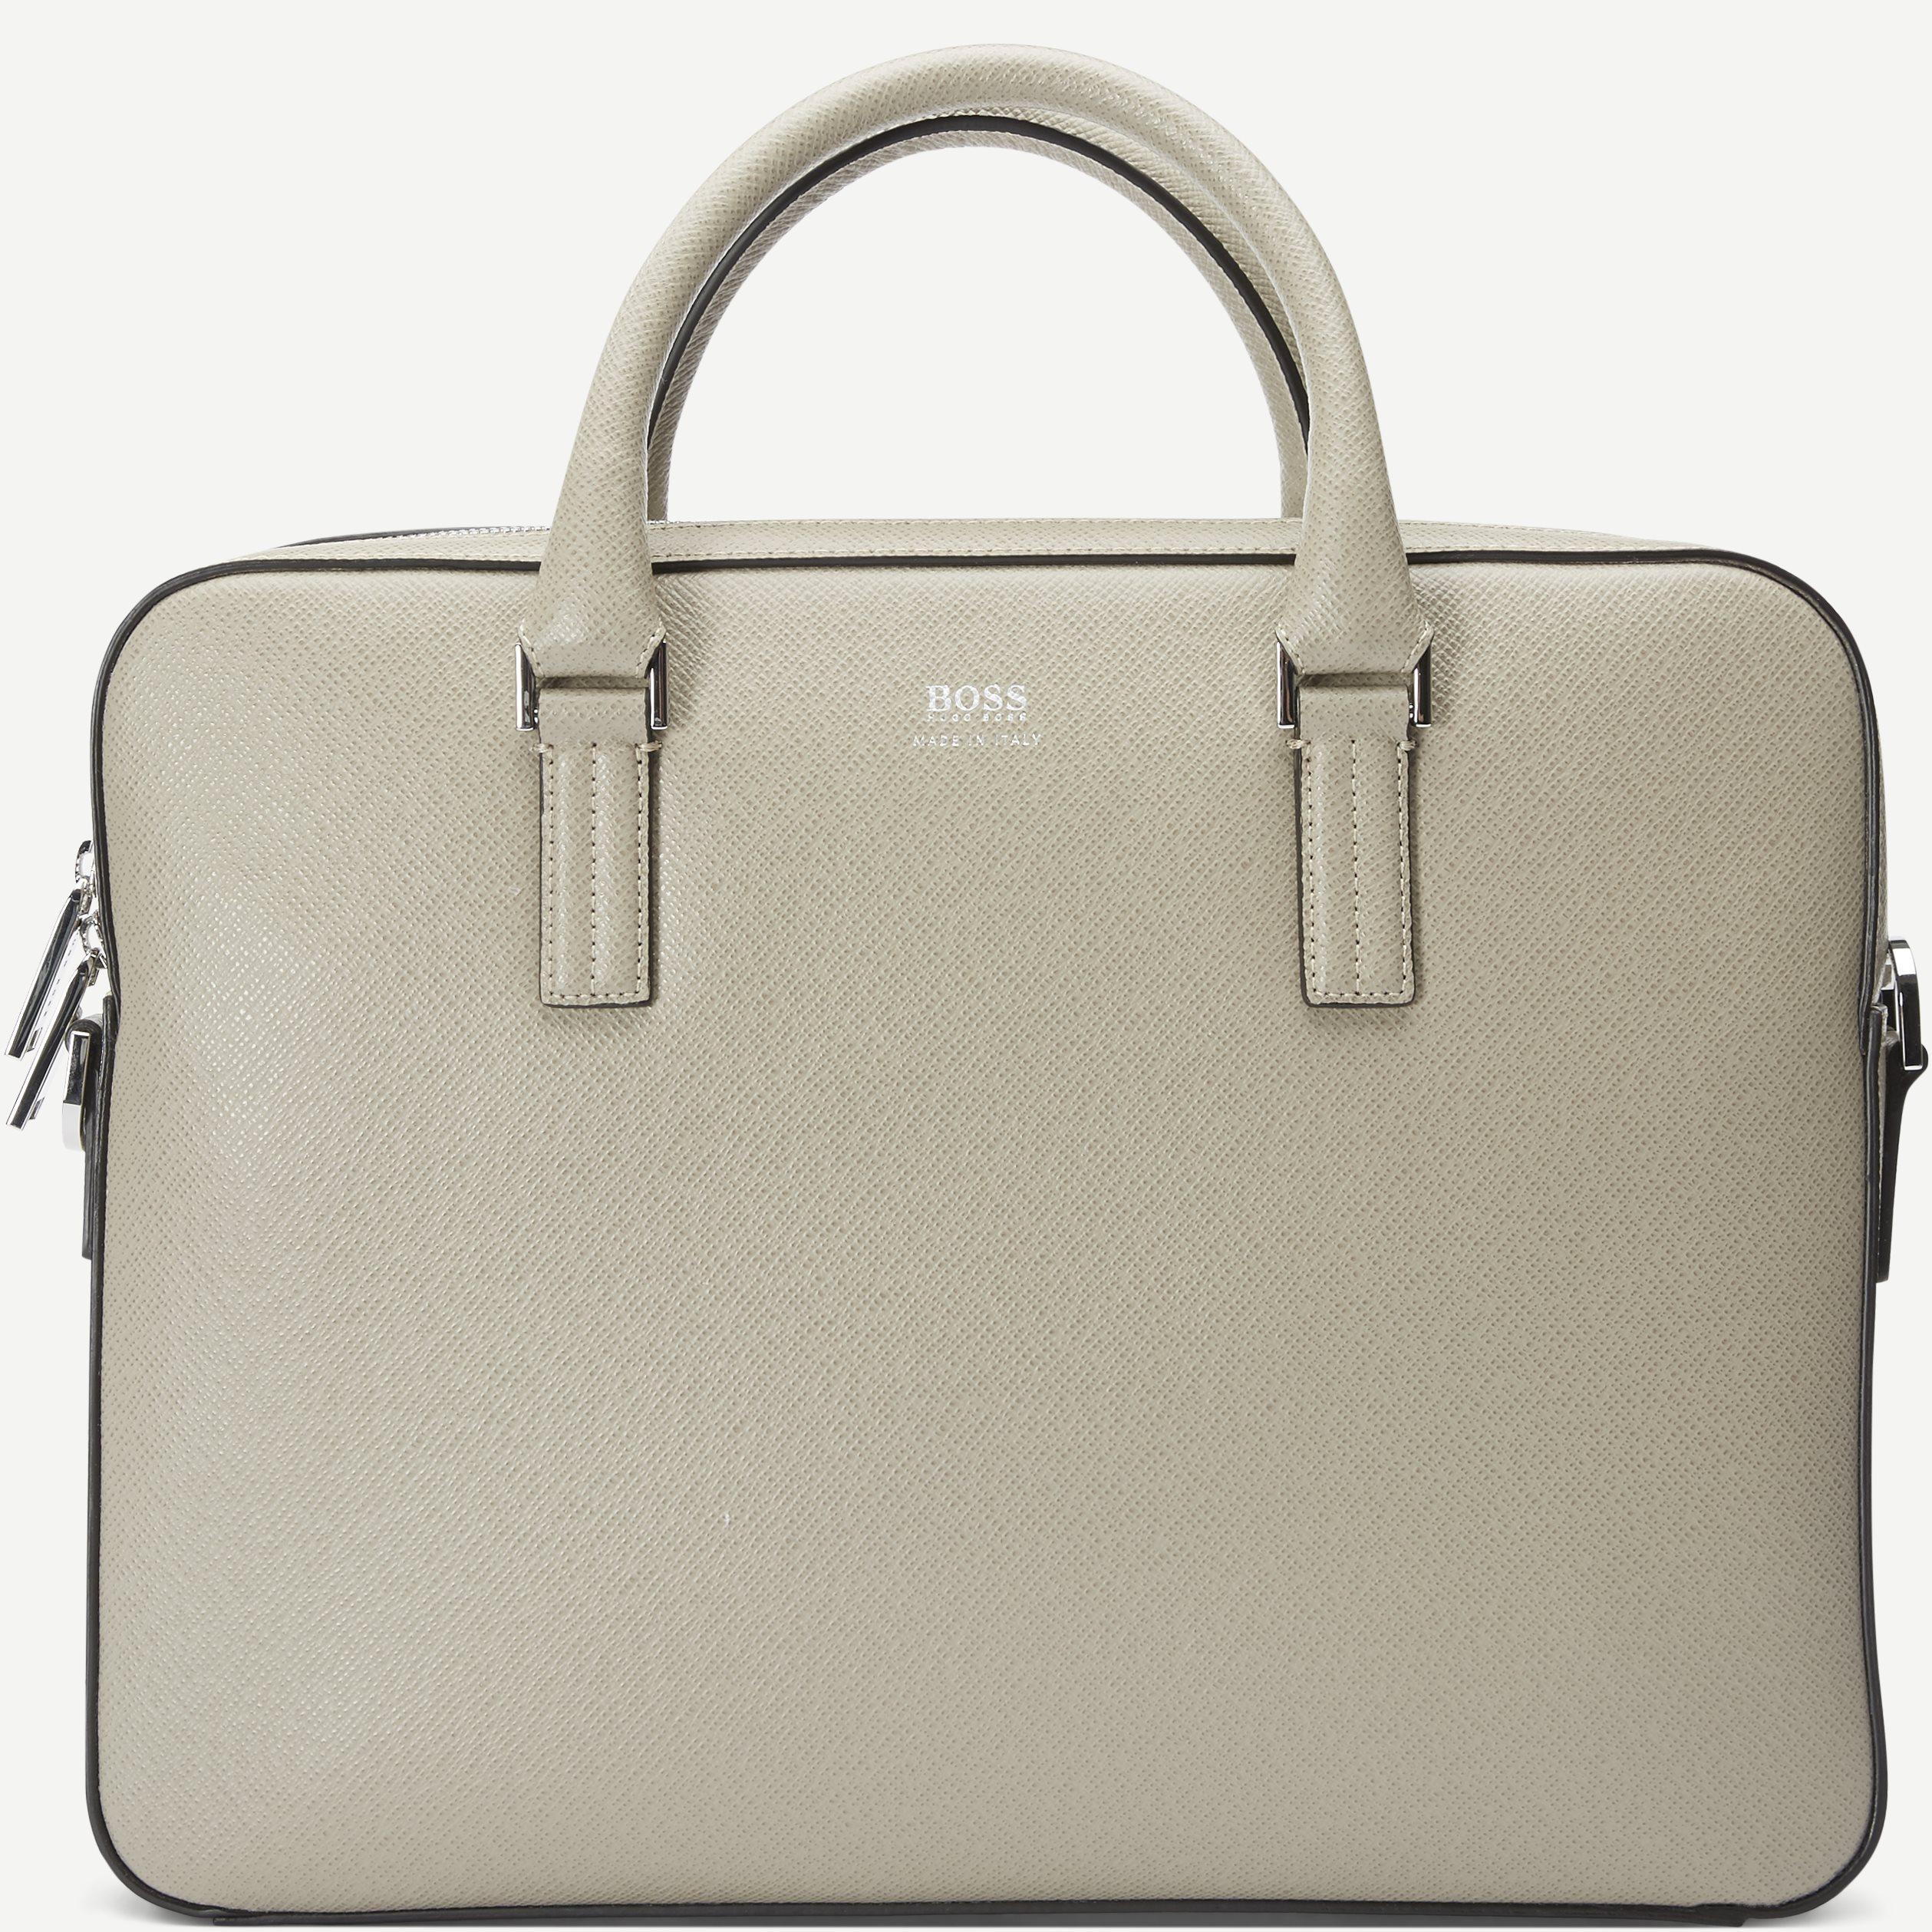 Signature_Slim Bag - Väskor - Sand